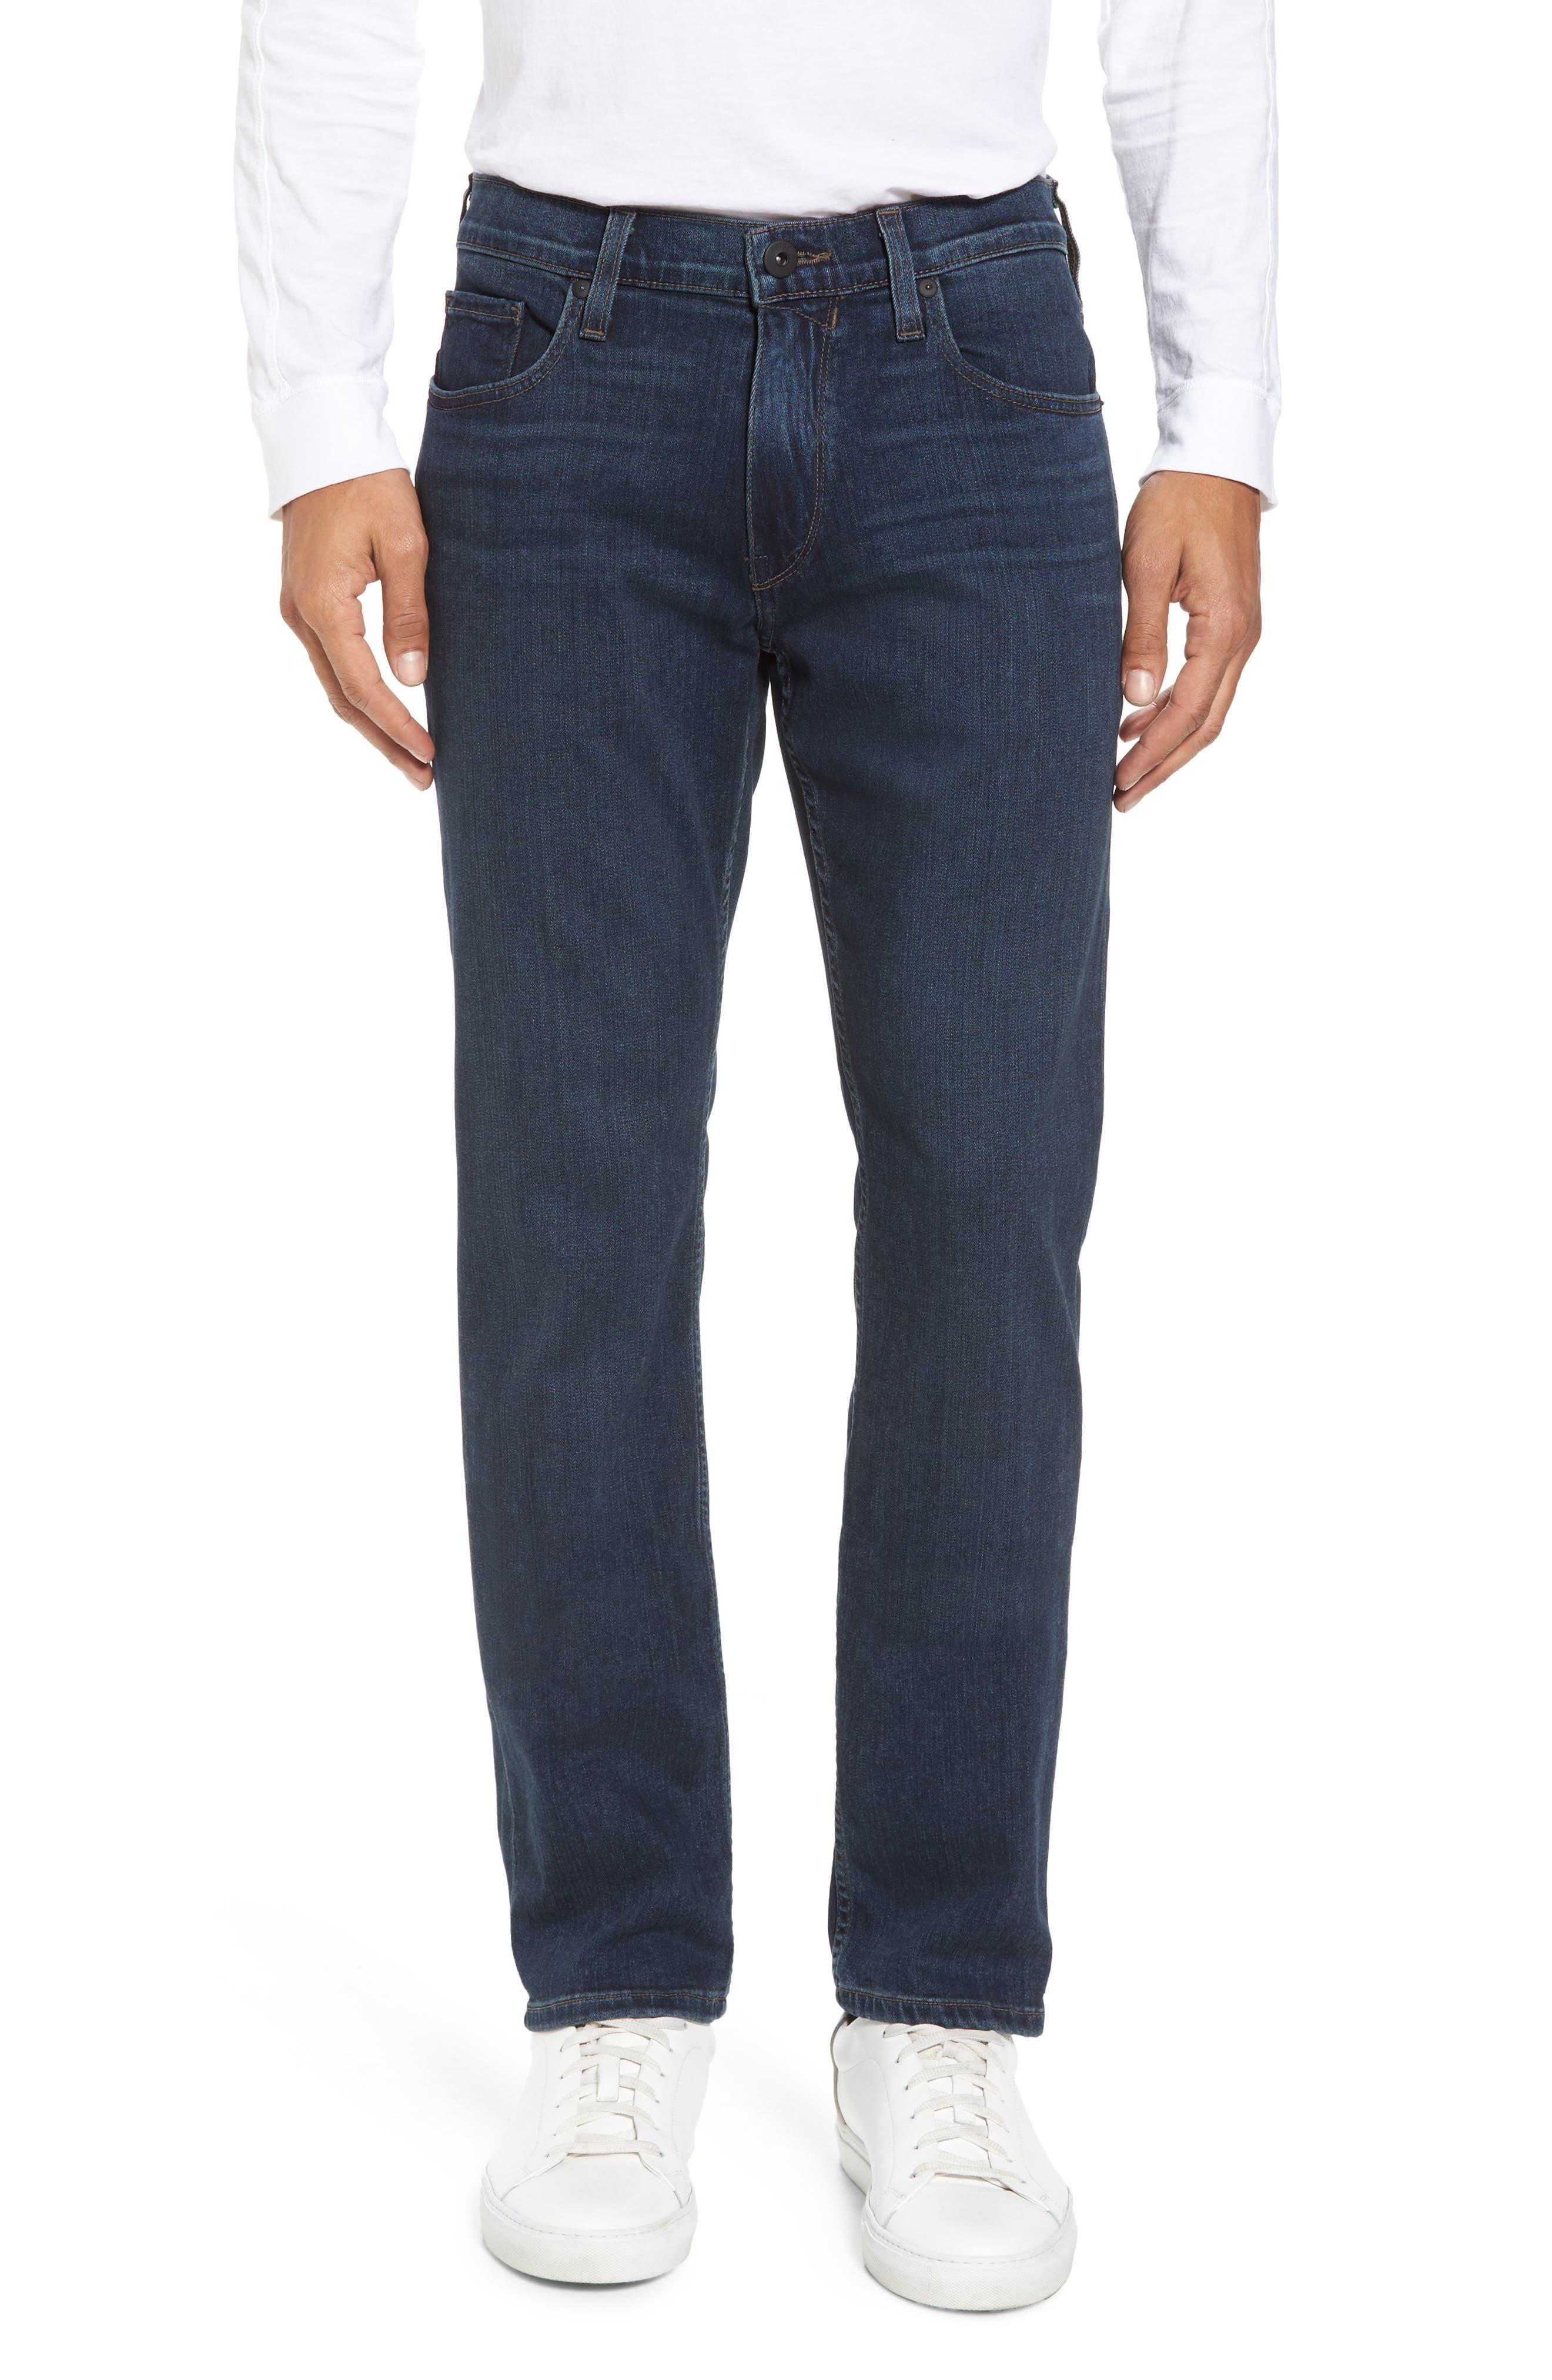 Main Image - PAIGE Transcend - Federal Slim Straight Fit Jeans (Benji)